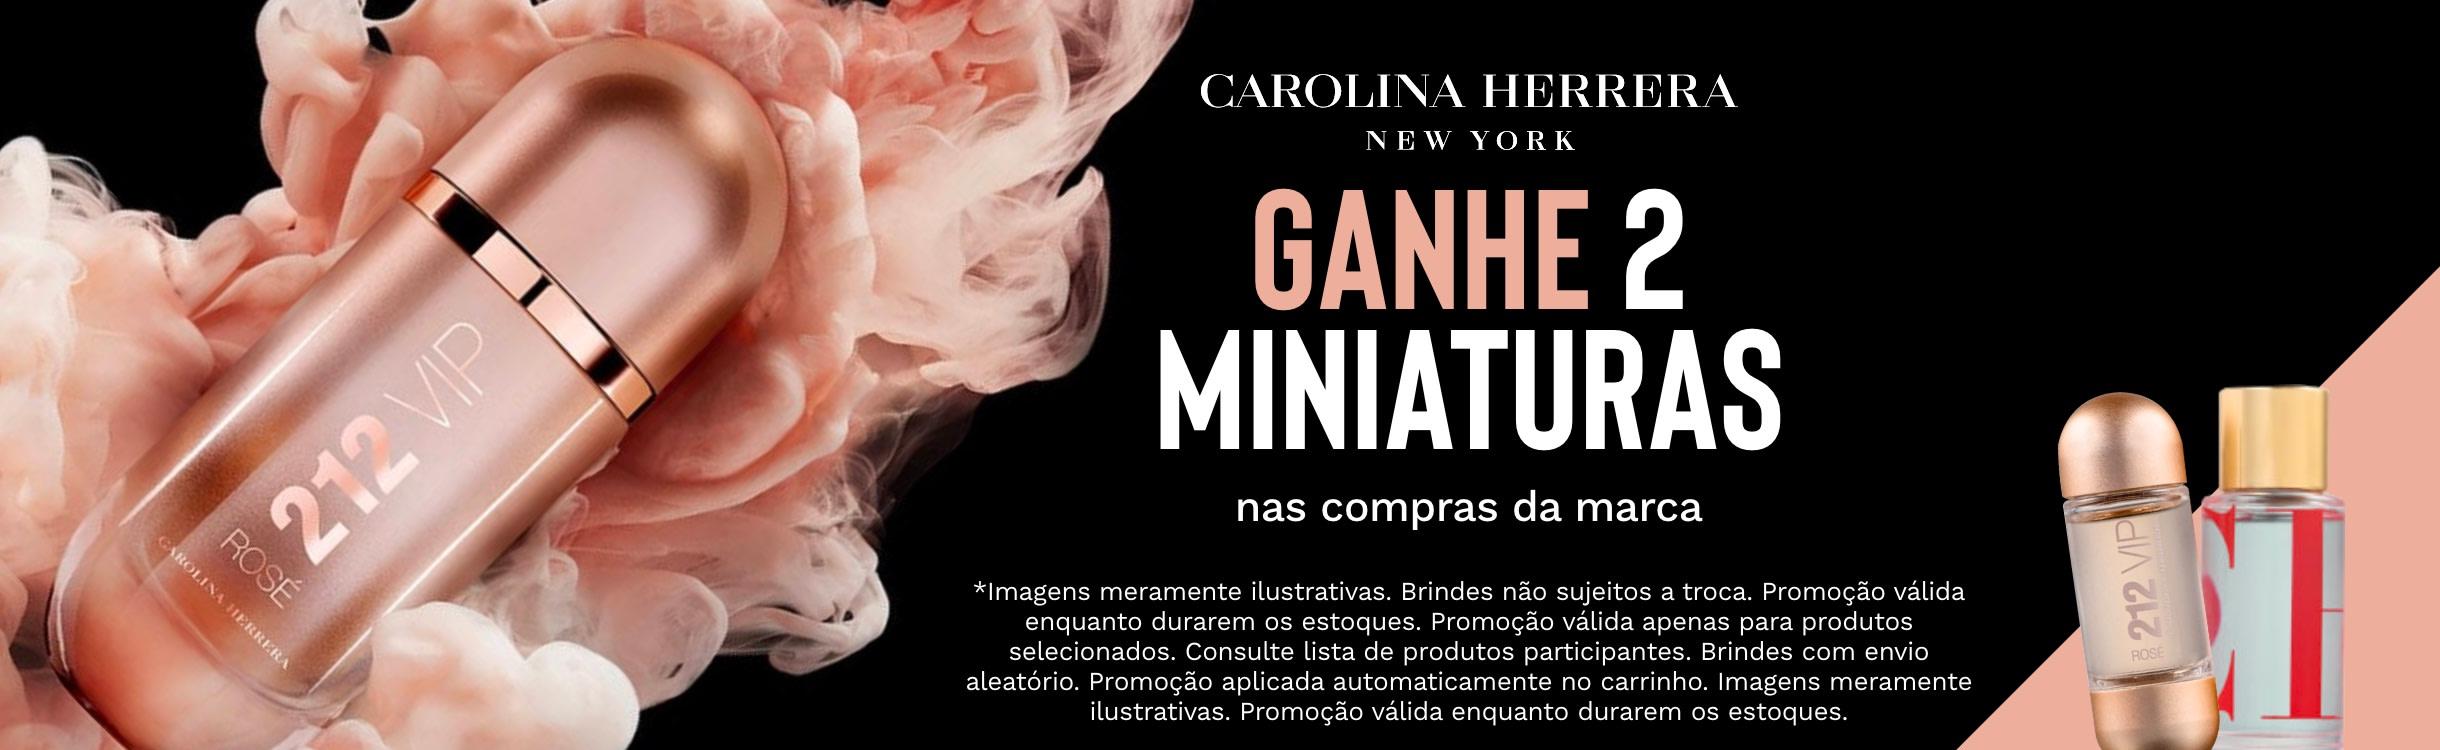 Perfumes Carolina Herrera